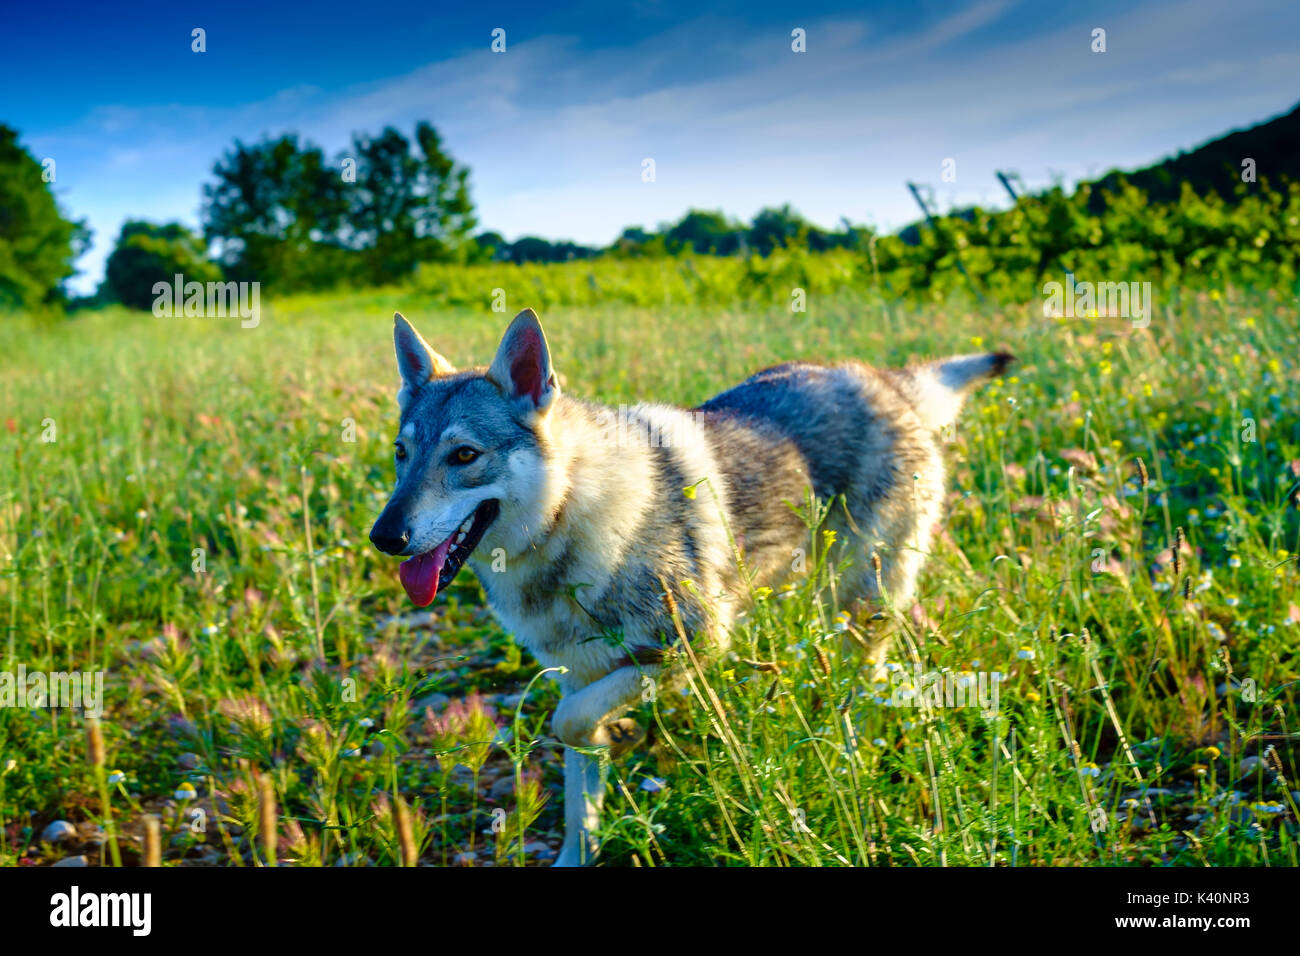 Czechoslovakian wolfdog on the field. Ayegui, Navarre, Spain. - Stock Image